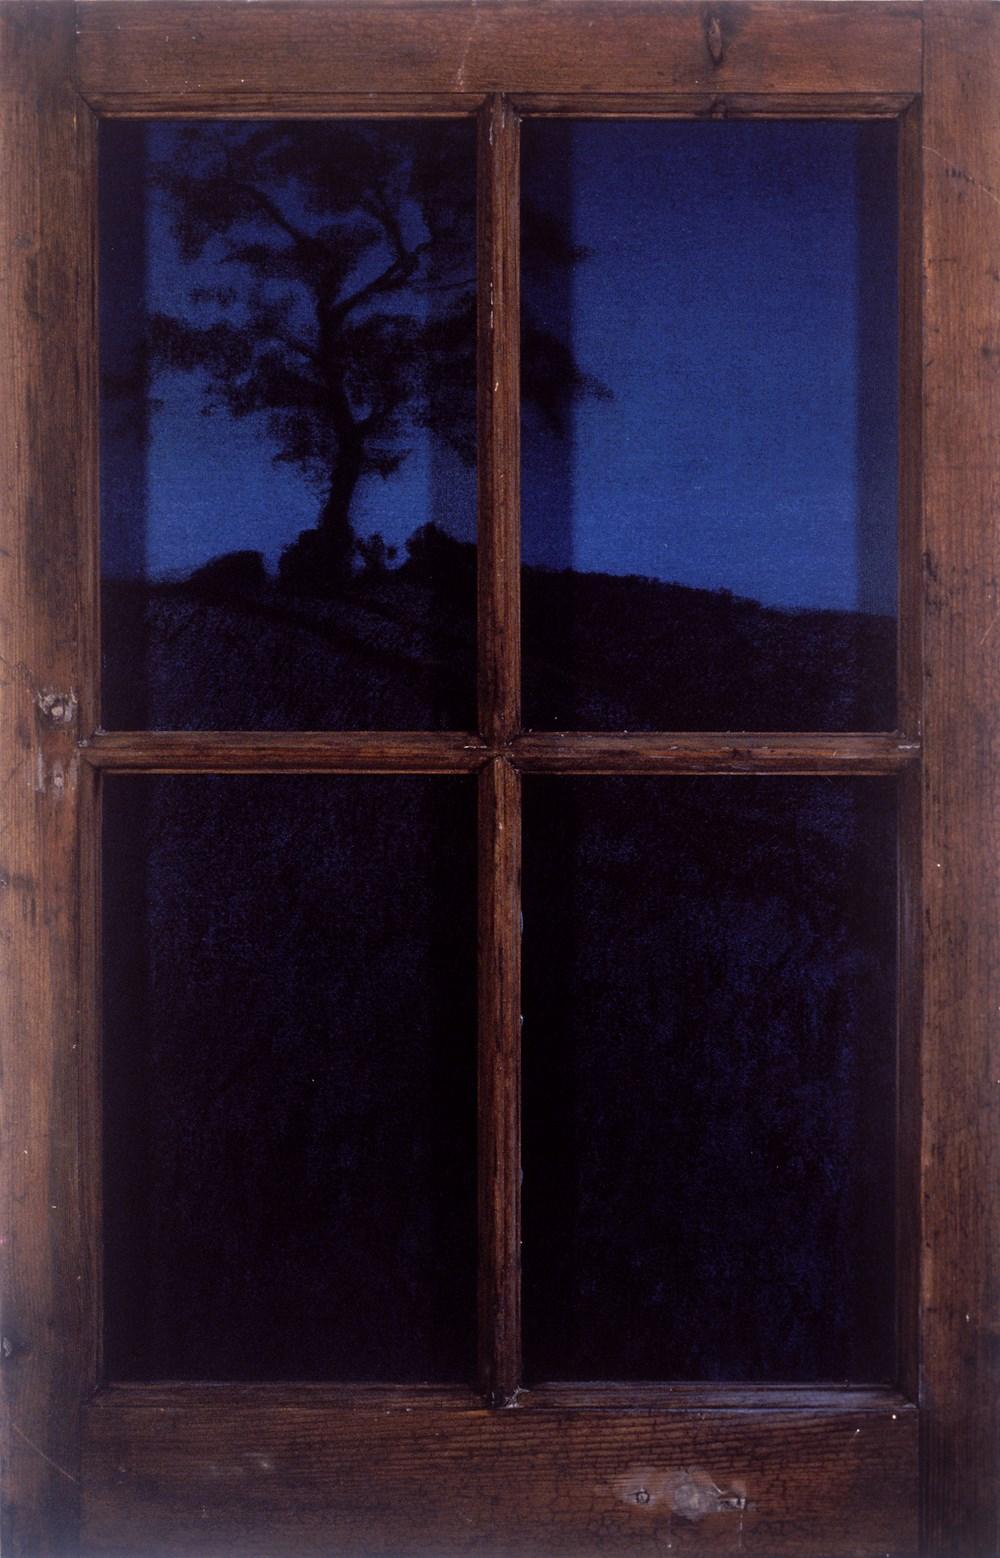 Studio Sale | Rachel McDonnell - Lot 26, Rachel McDonnell, Window I